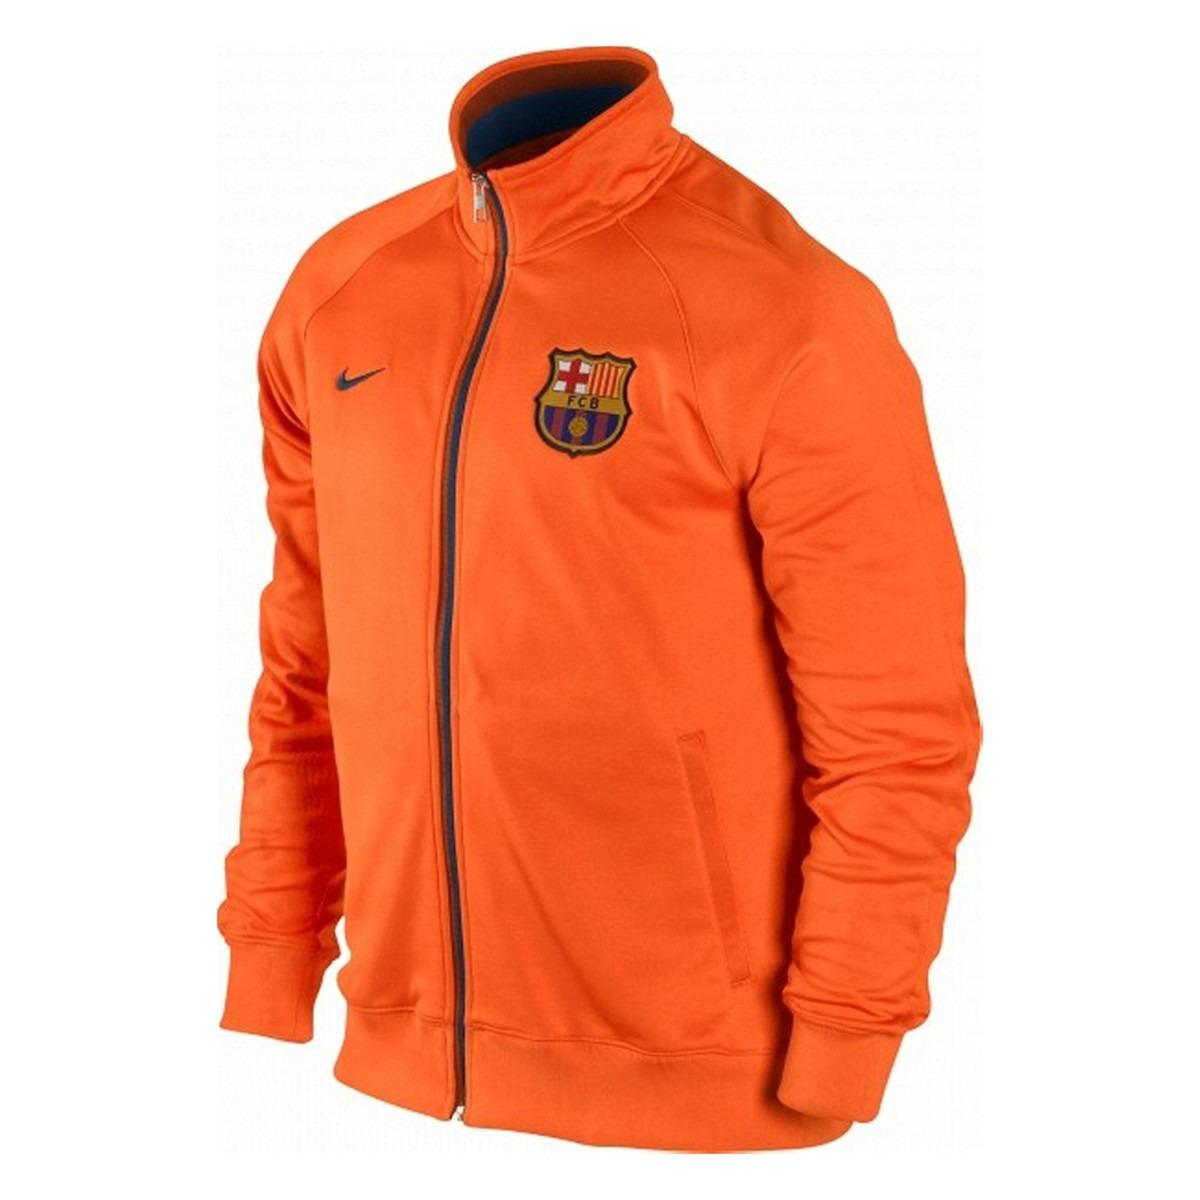 eafdab8fcc2a1 Chaquetas O Buso Nike Barcelona Futbol Club - New -   199.997 en ...